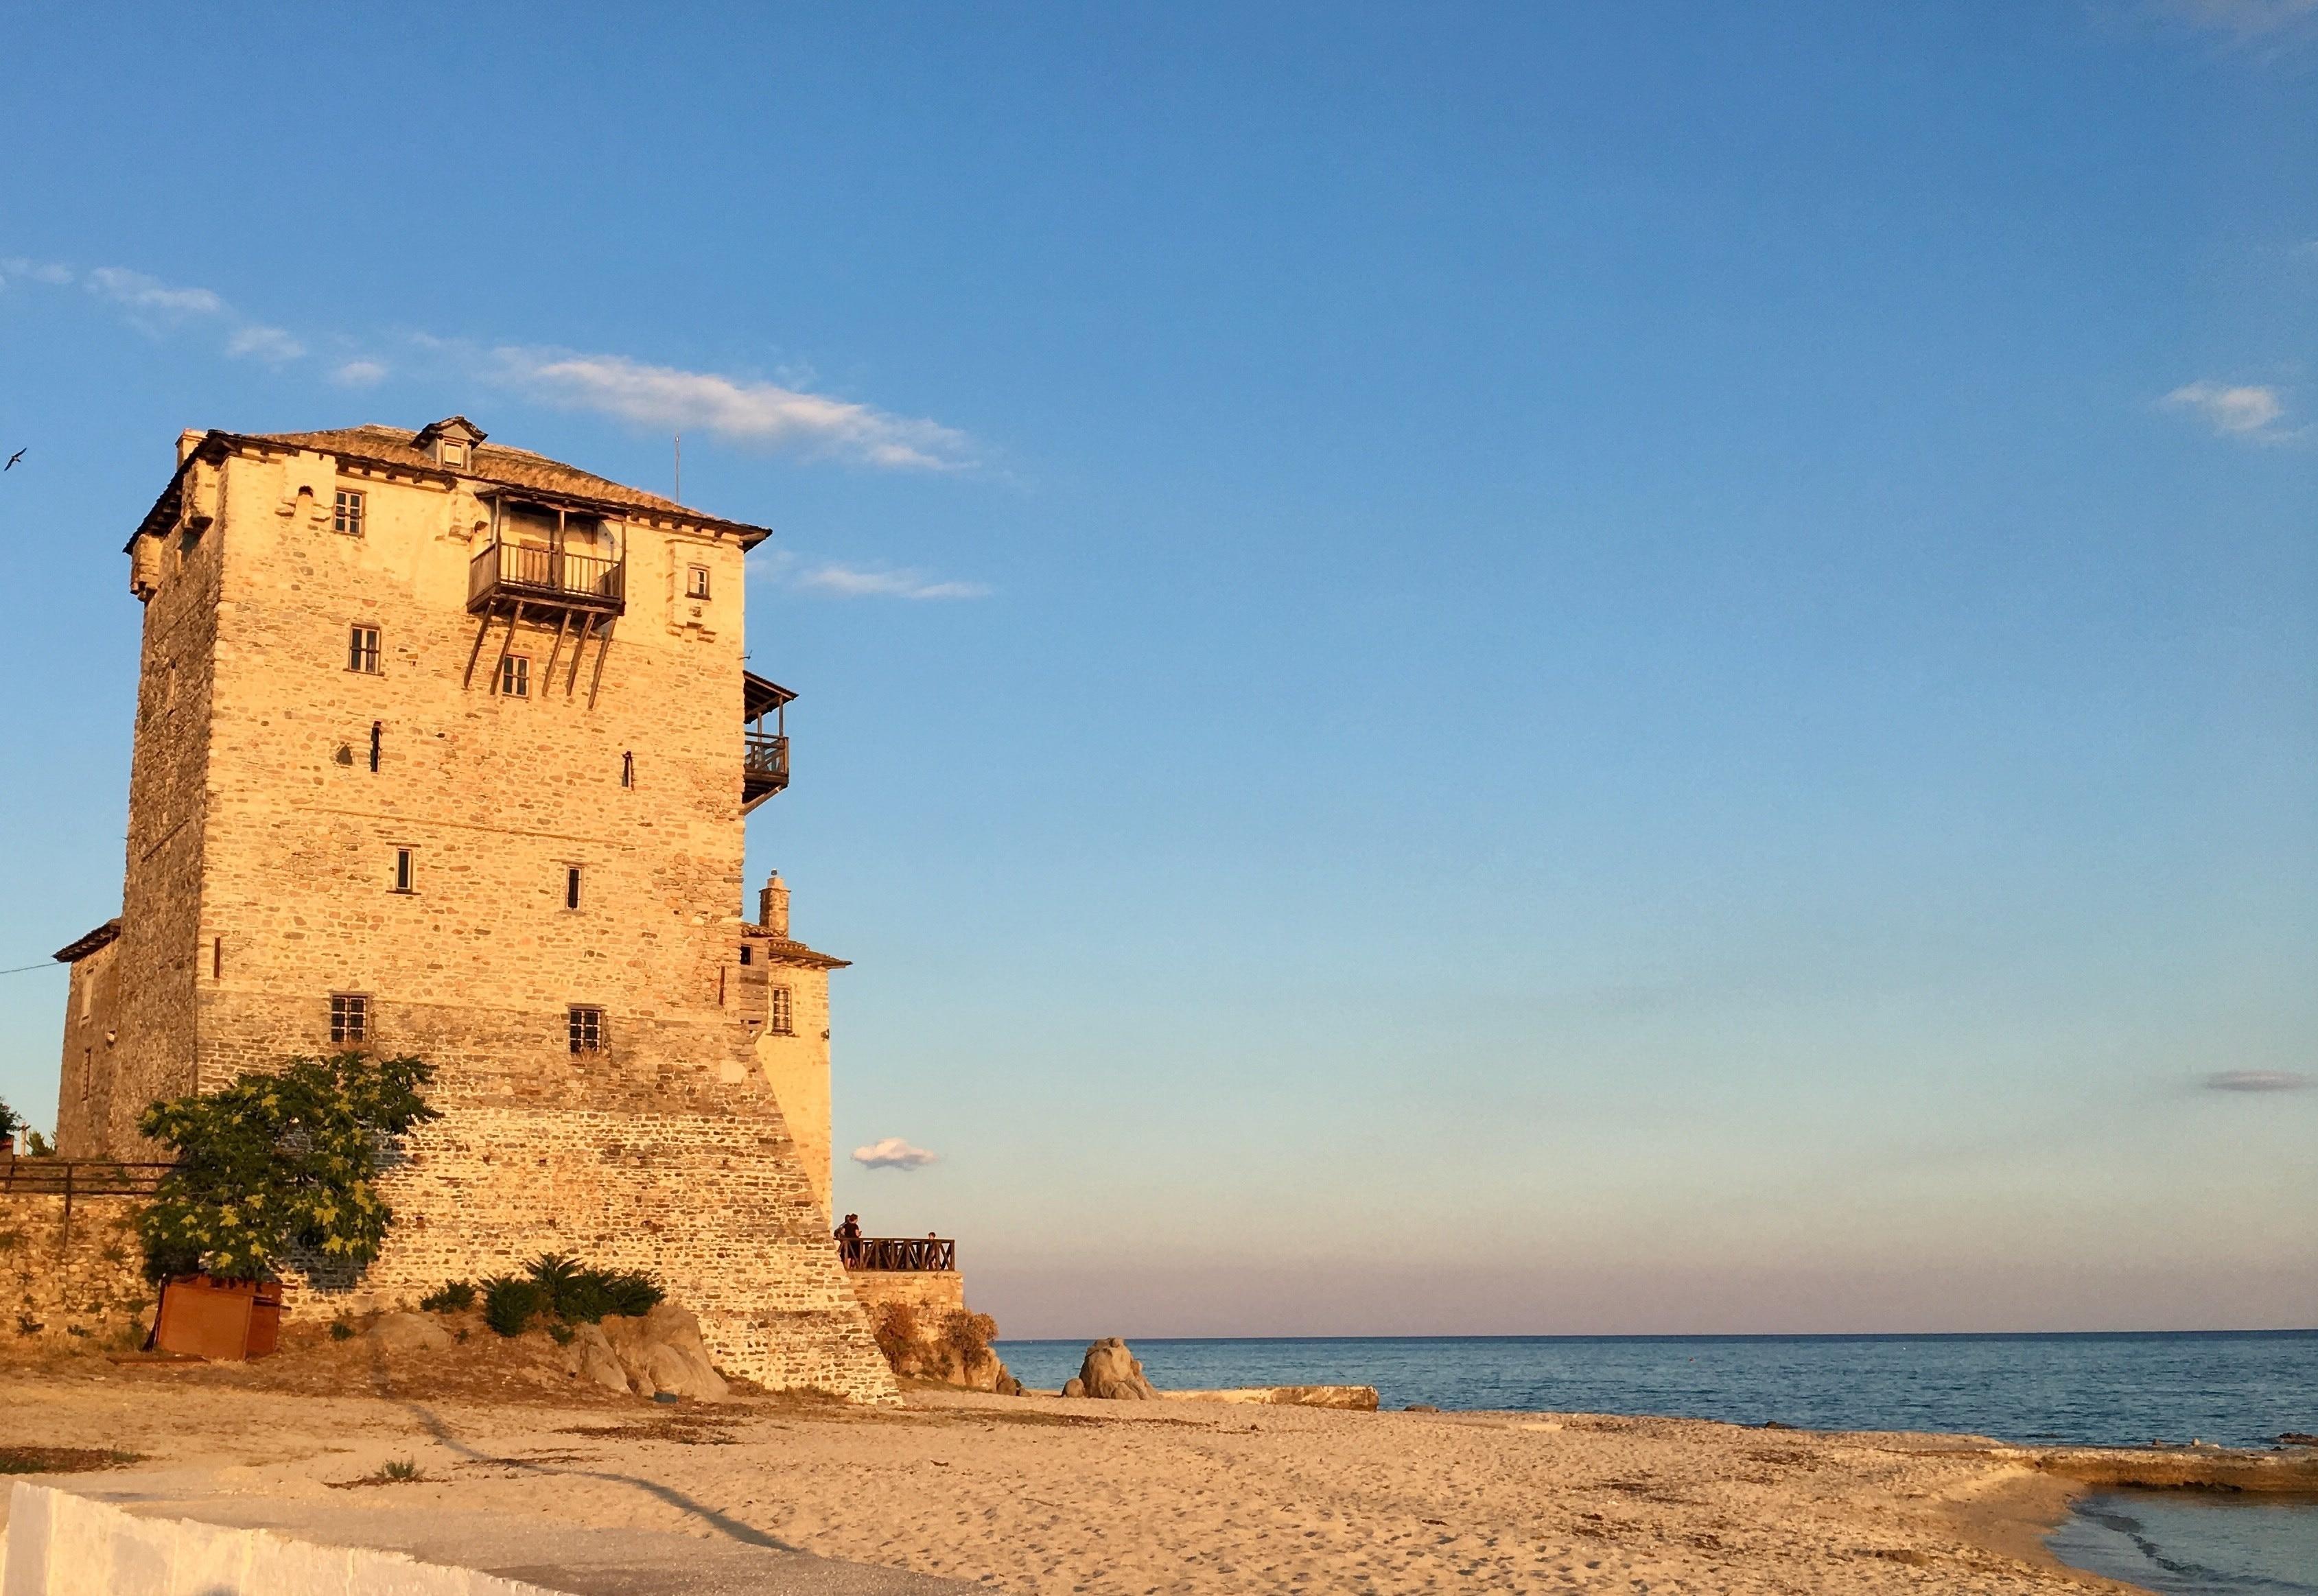 Ouranoupoli Beach, Aristotelis, Central Macedonia, Greece